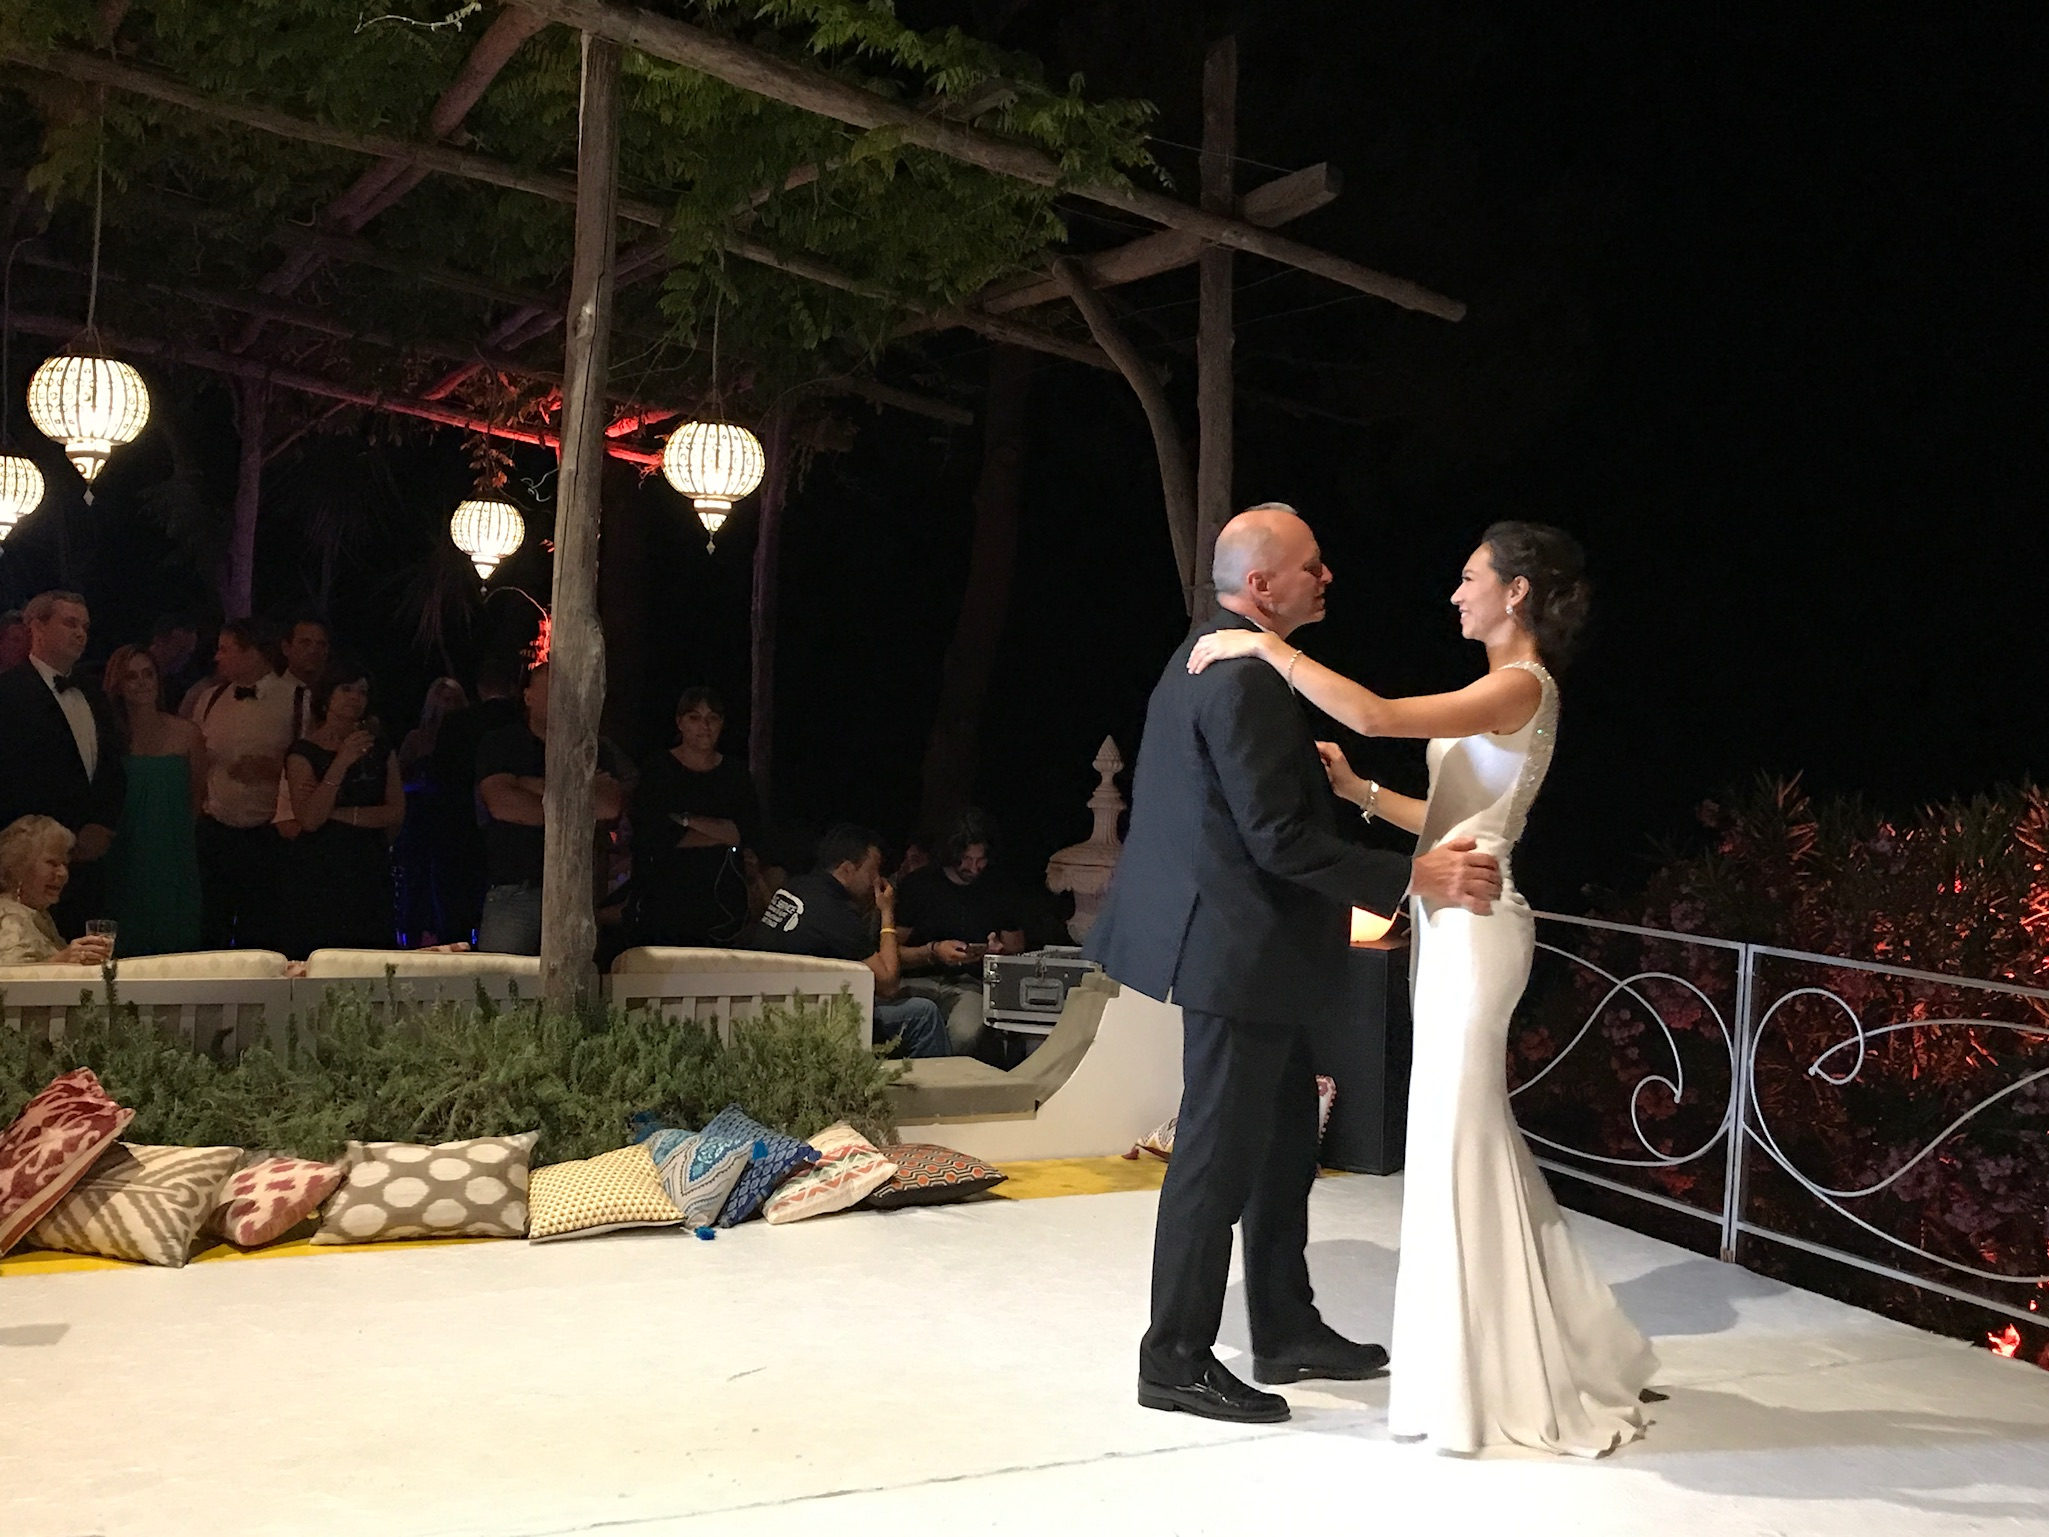 https://www.weddingamalfi.com/wp-content/uploads/Nathalie-and-Benjamin-wedding-in-Positano-6.jpg